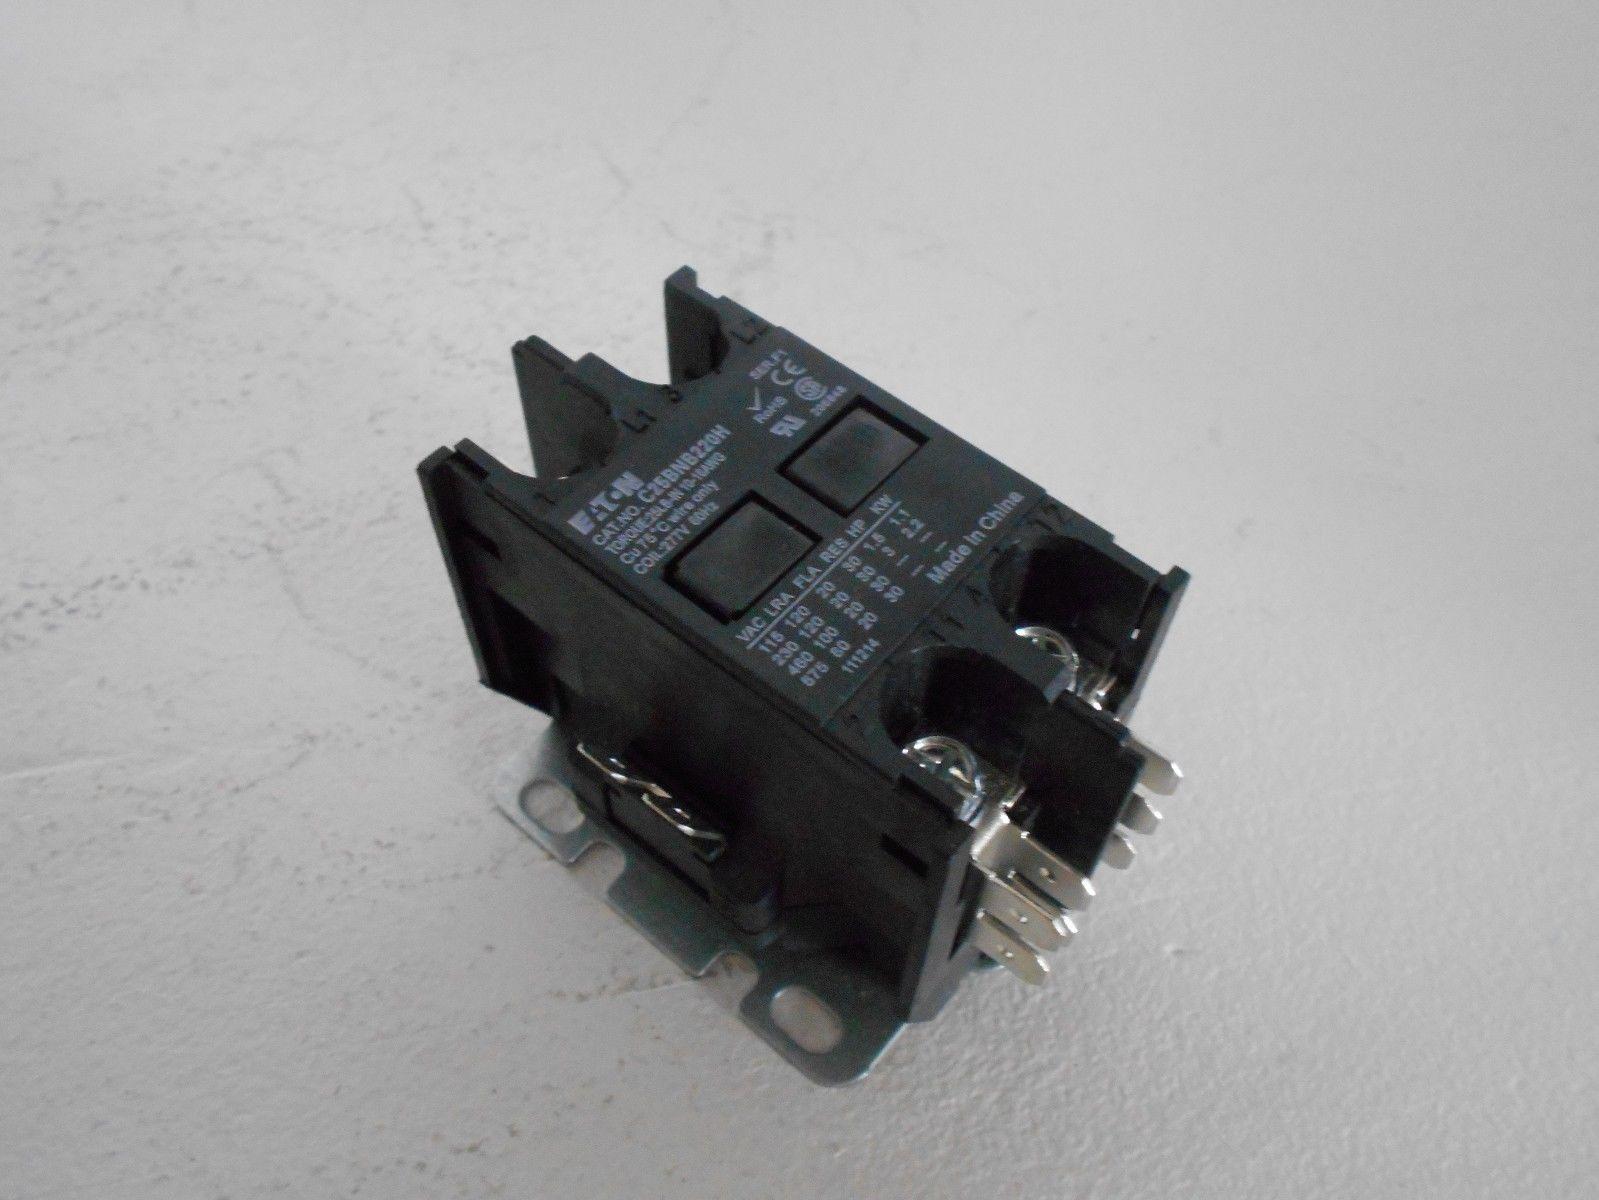 NEW IN THE BOX Eaton Cutler Hammer C25BNB220H Definite Purpose Contactor 231491980923 3?fit\\\\\\\=1000%2C750\\\\\\\&ssl\\\\\\\=1 mcg contactor wiring diagram contactor wiring diagram single phase mcg contactors wiring diagram at reclaimingppi.co